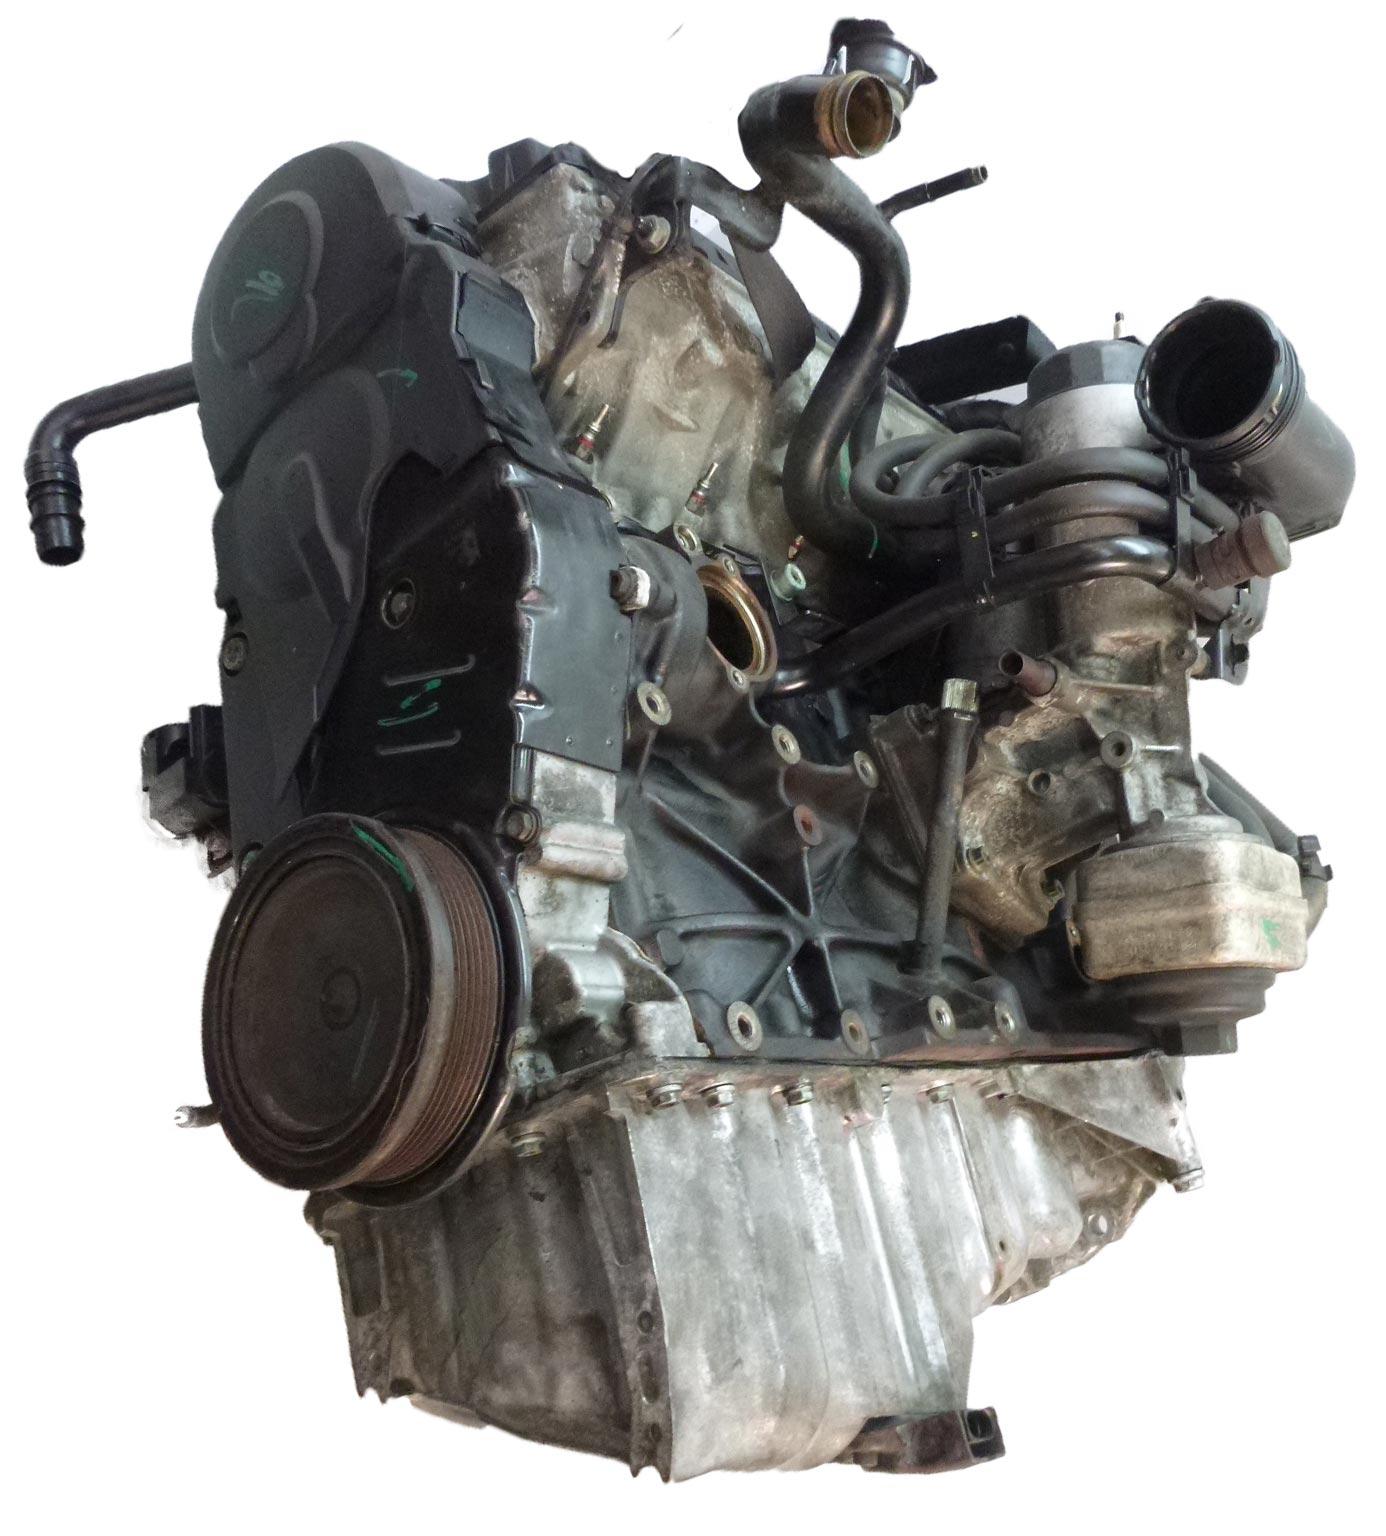 Motor Audi A4 B6 1,9 TDI Diesel BKE mit PD-Elementen und Anbauteilen DE300380